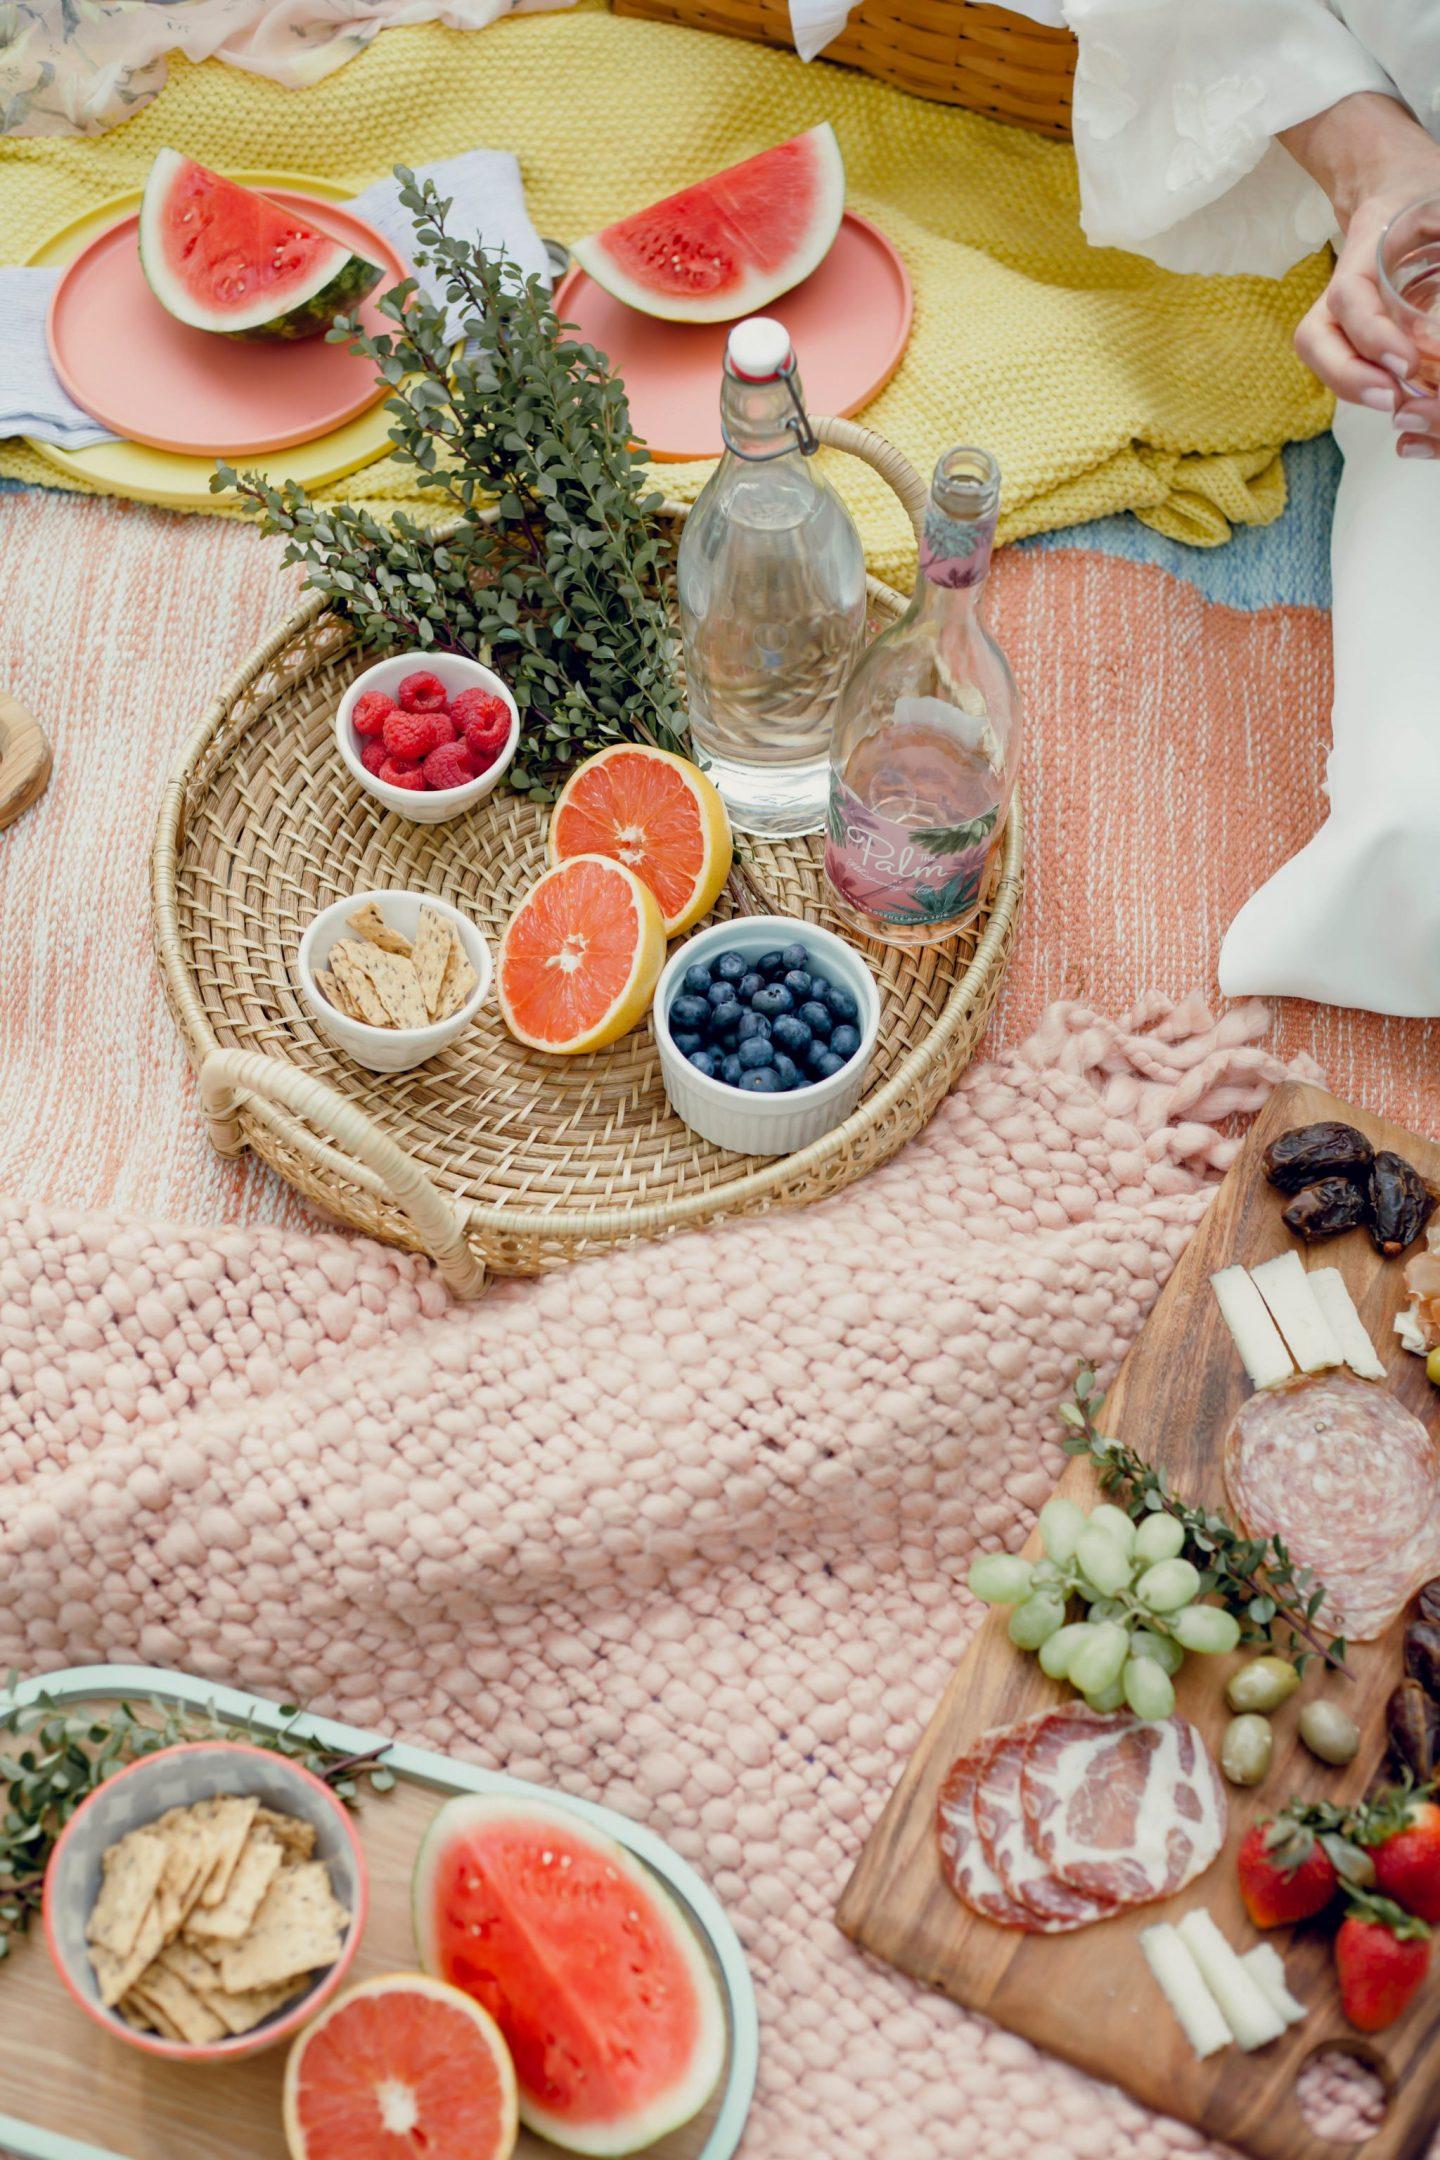 picnic - cheese & charcuterie - Lauren Schwaiger Lifestyle Blog